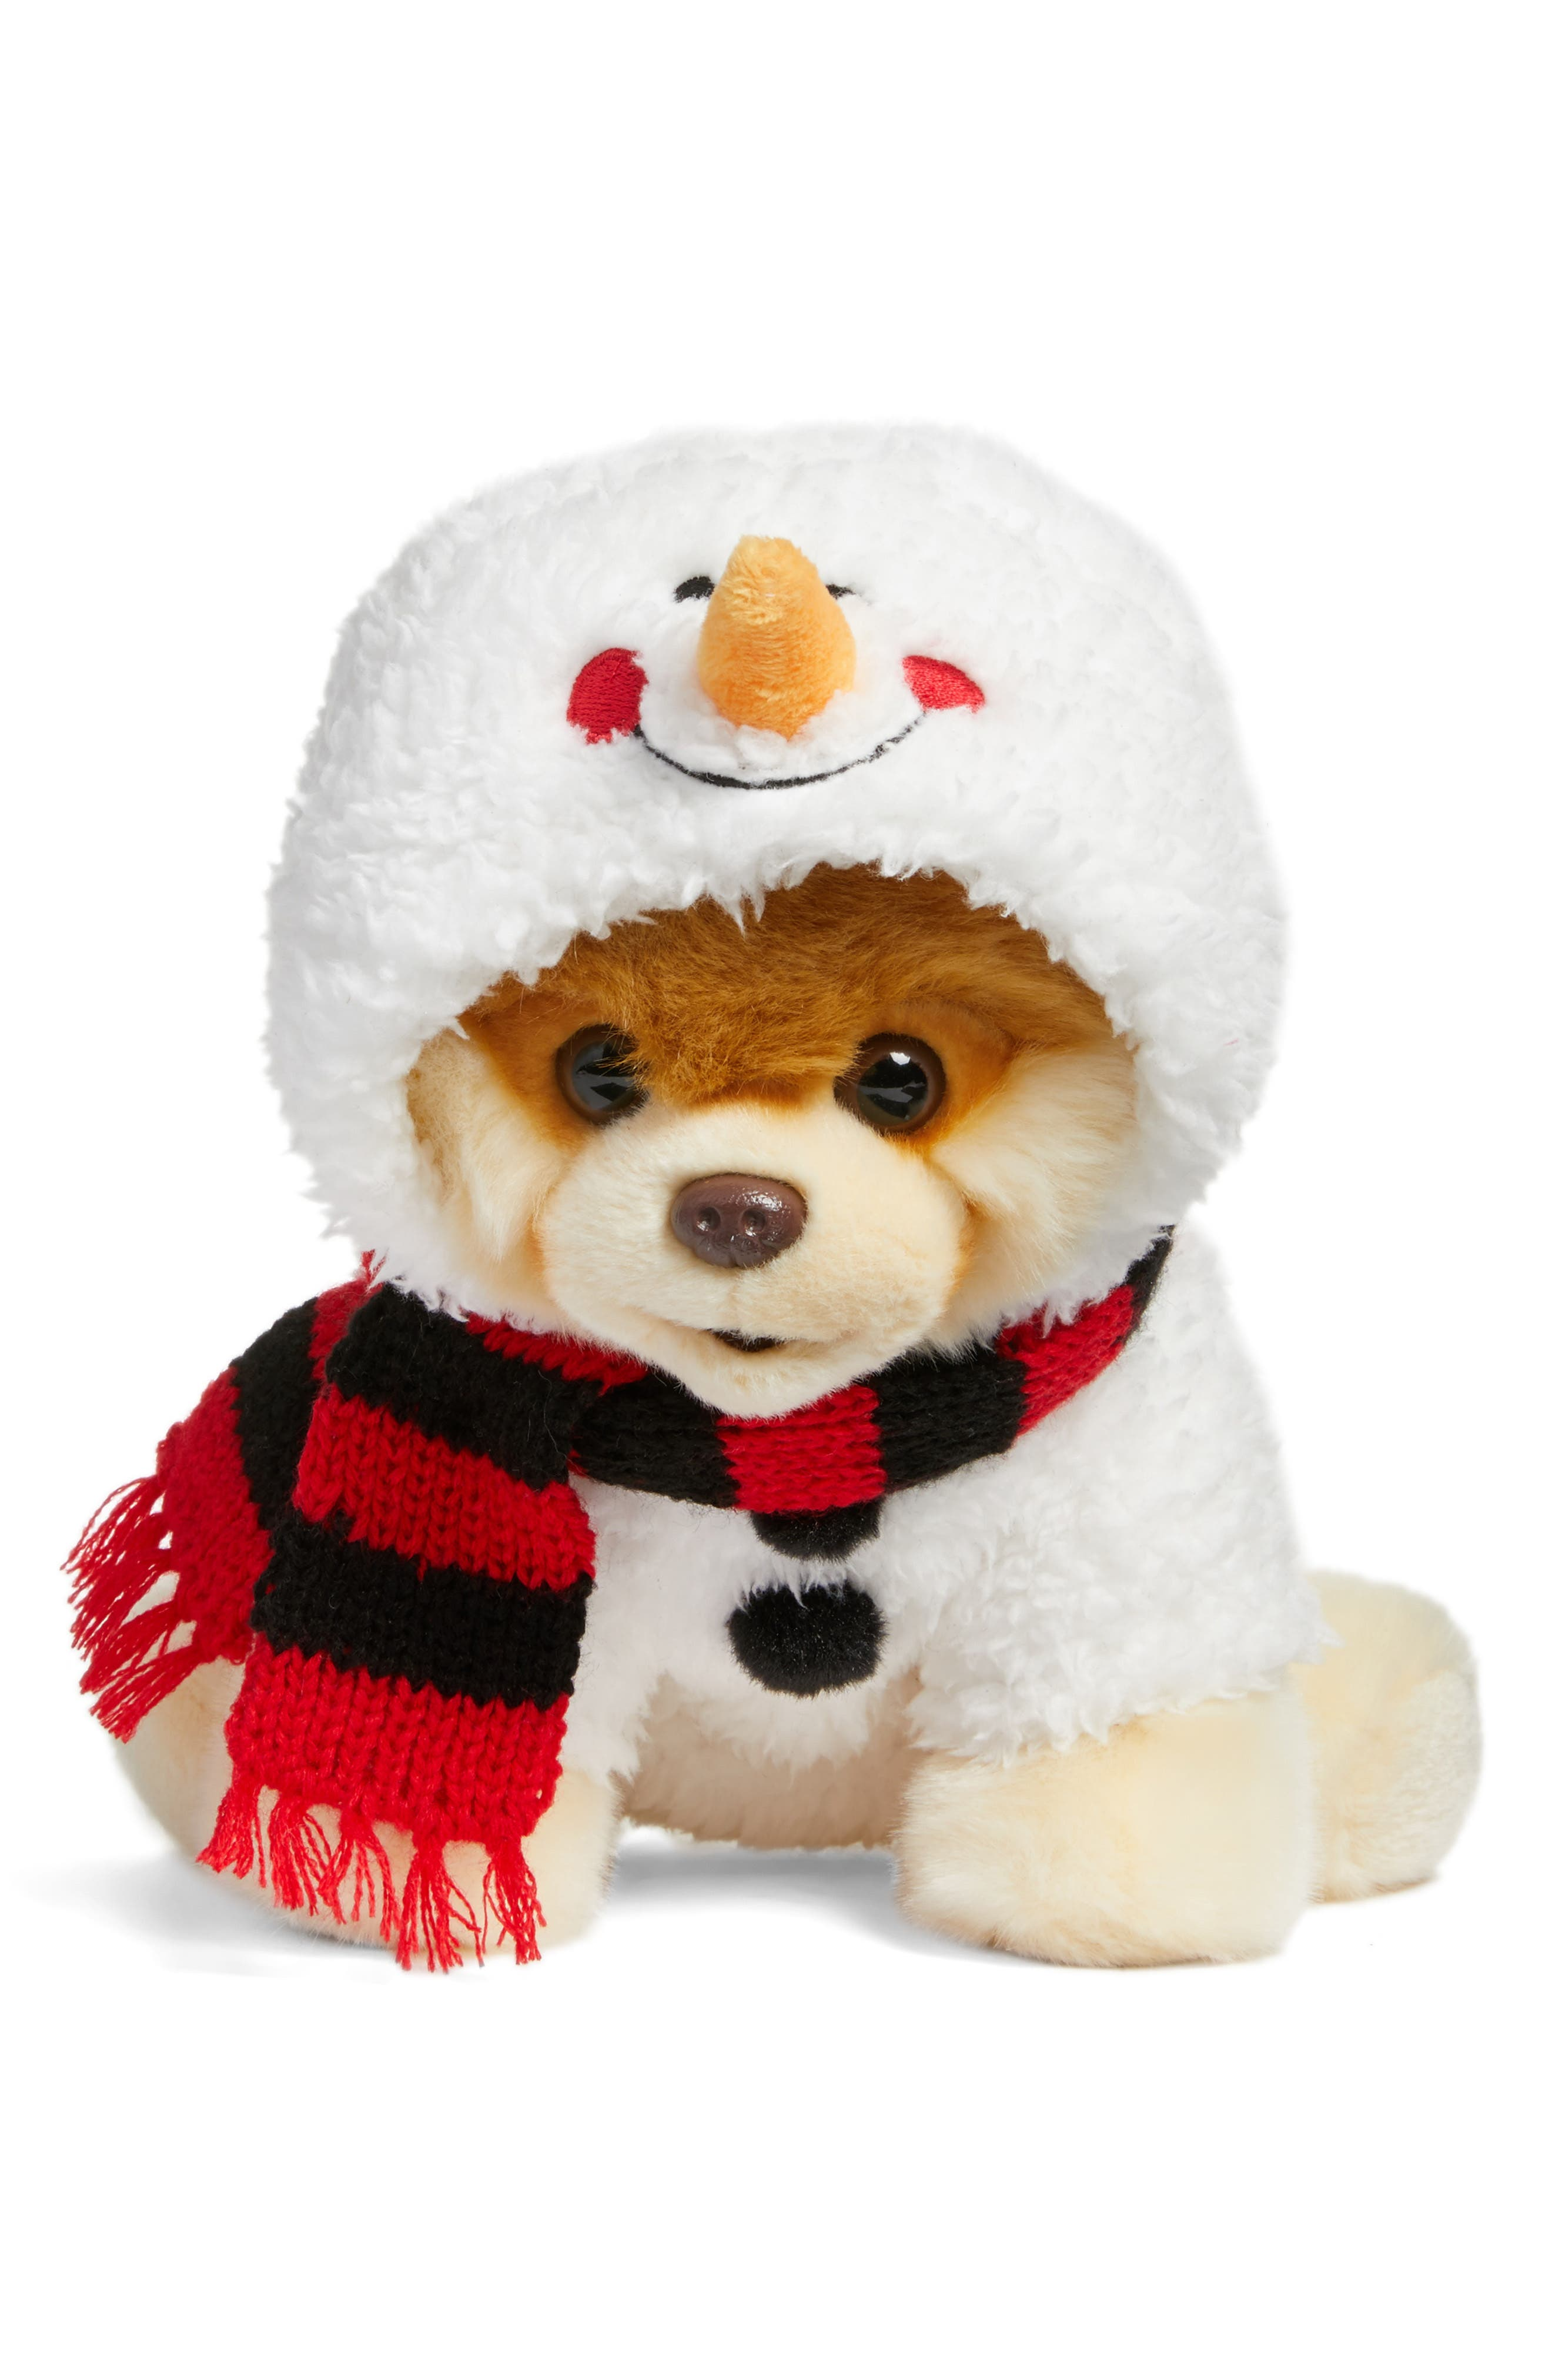 Boo - Snowman Hoodie Stuffed Animal,                         Main,                         color, White